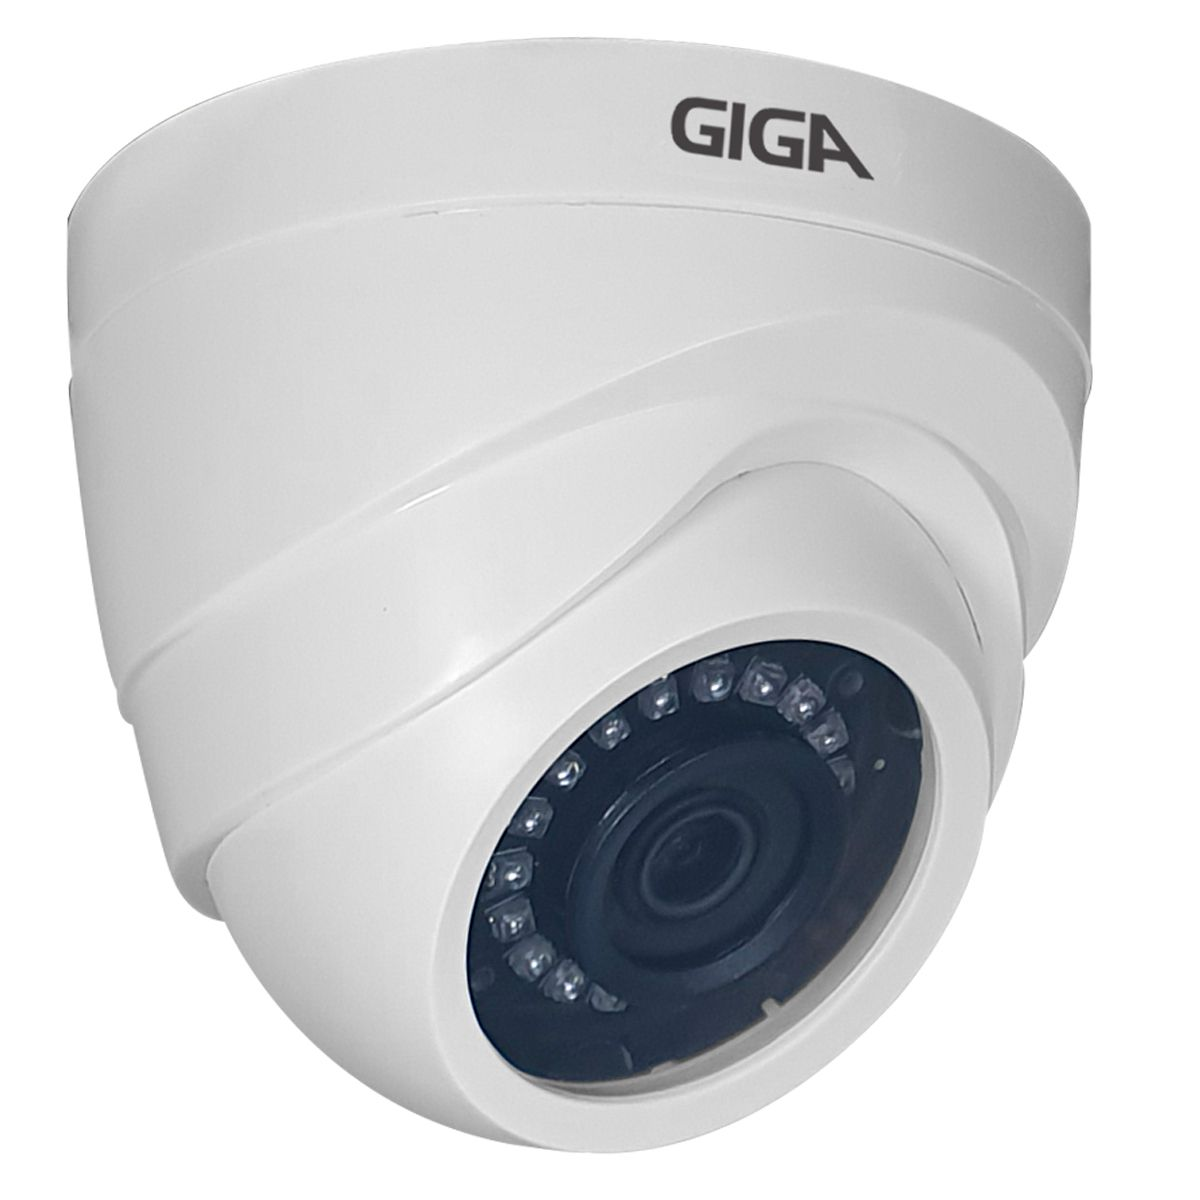 Kit Orion Giga Security 16 Câmeras HD 720p GS0019 + DVR Full HD com HD 1TB Seagate + Acessórios  - Tudo Forte